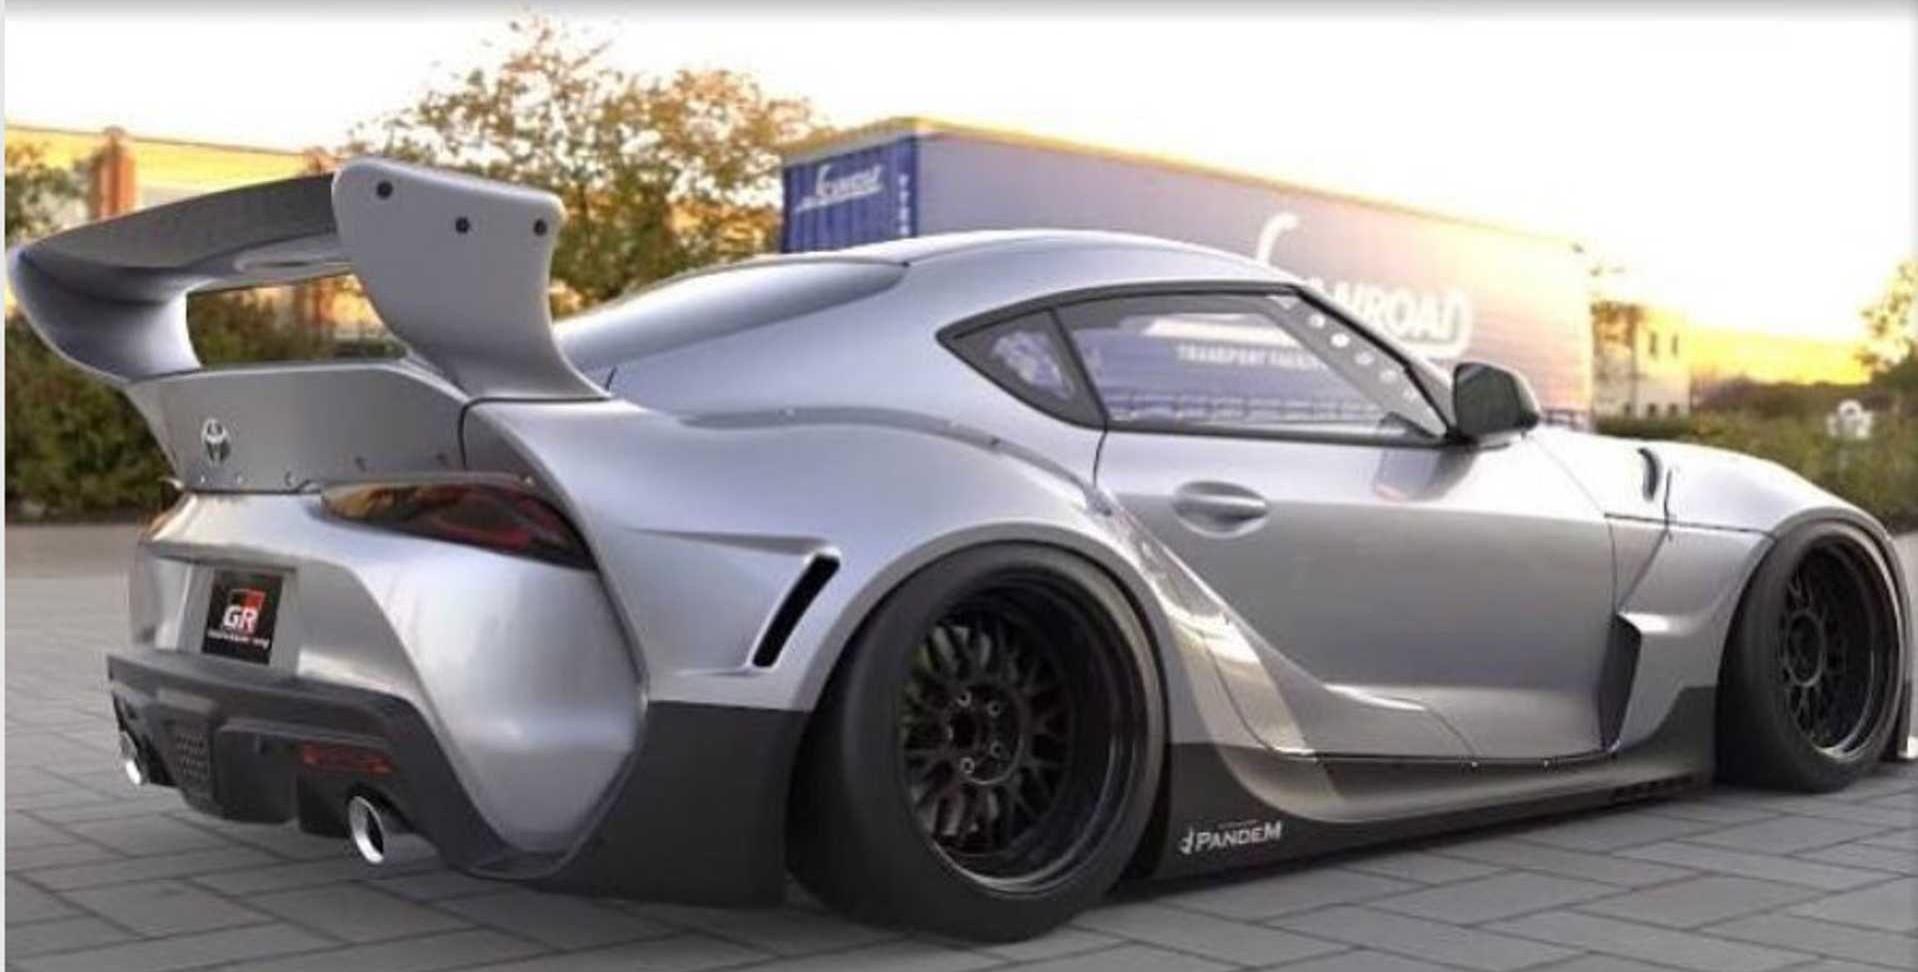 Rocket Bunny Toyota Supra wide bodykit (3)